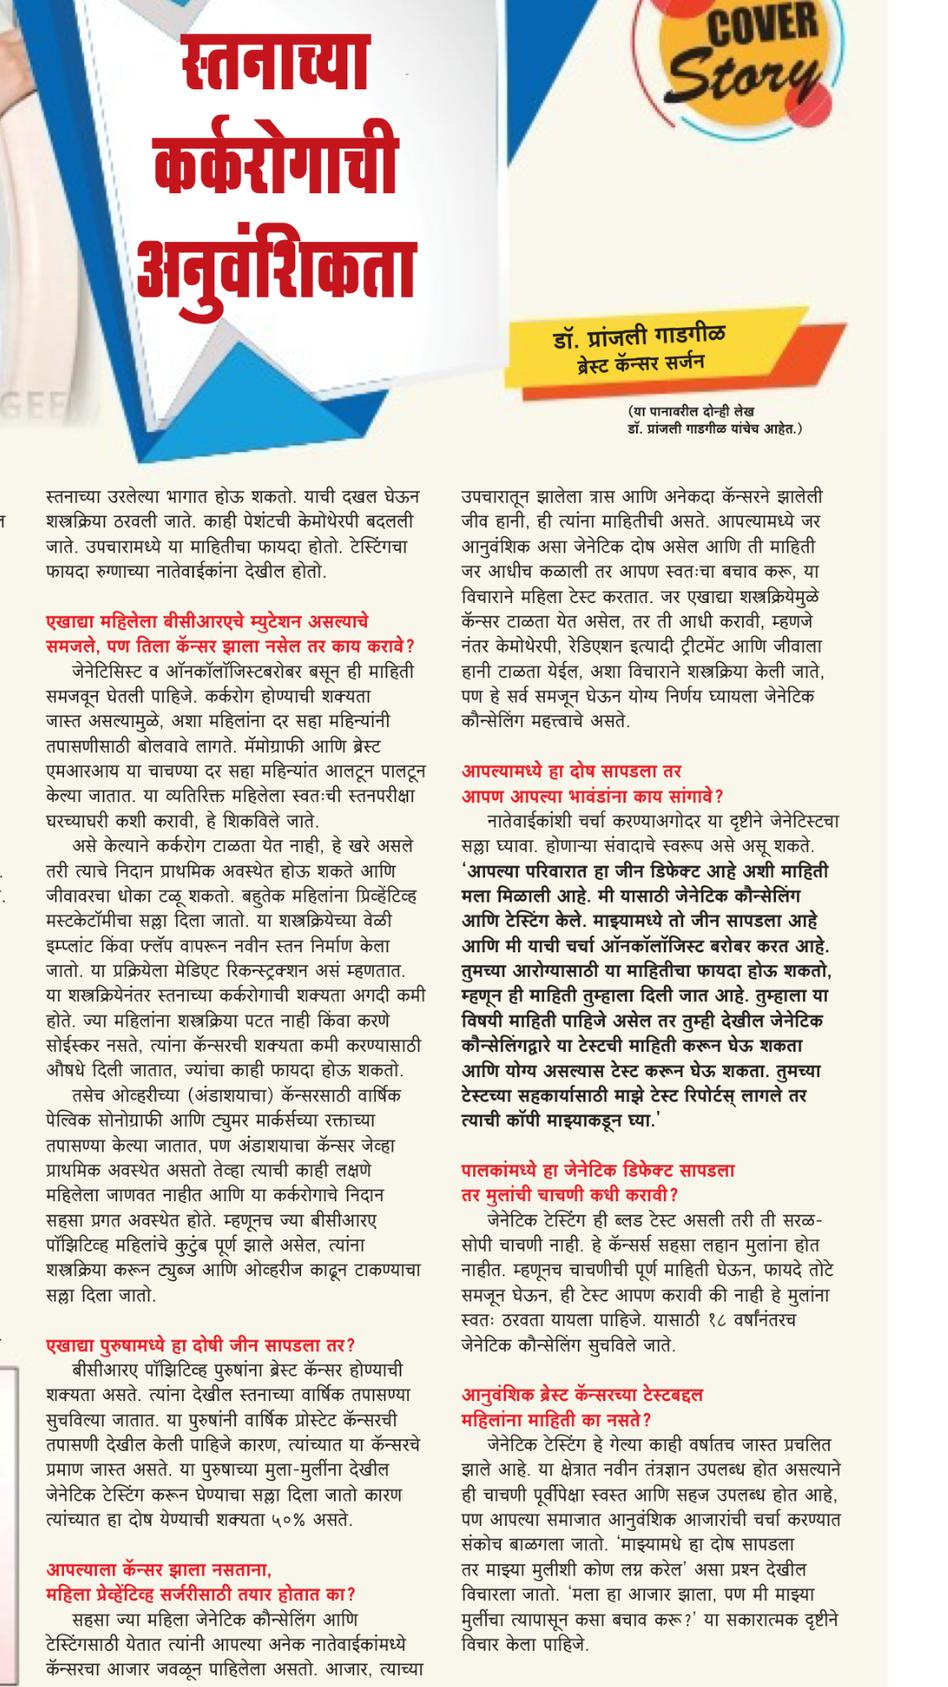 Hereditary Dr Pranjali Gadgil's article in Prabhat